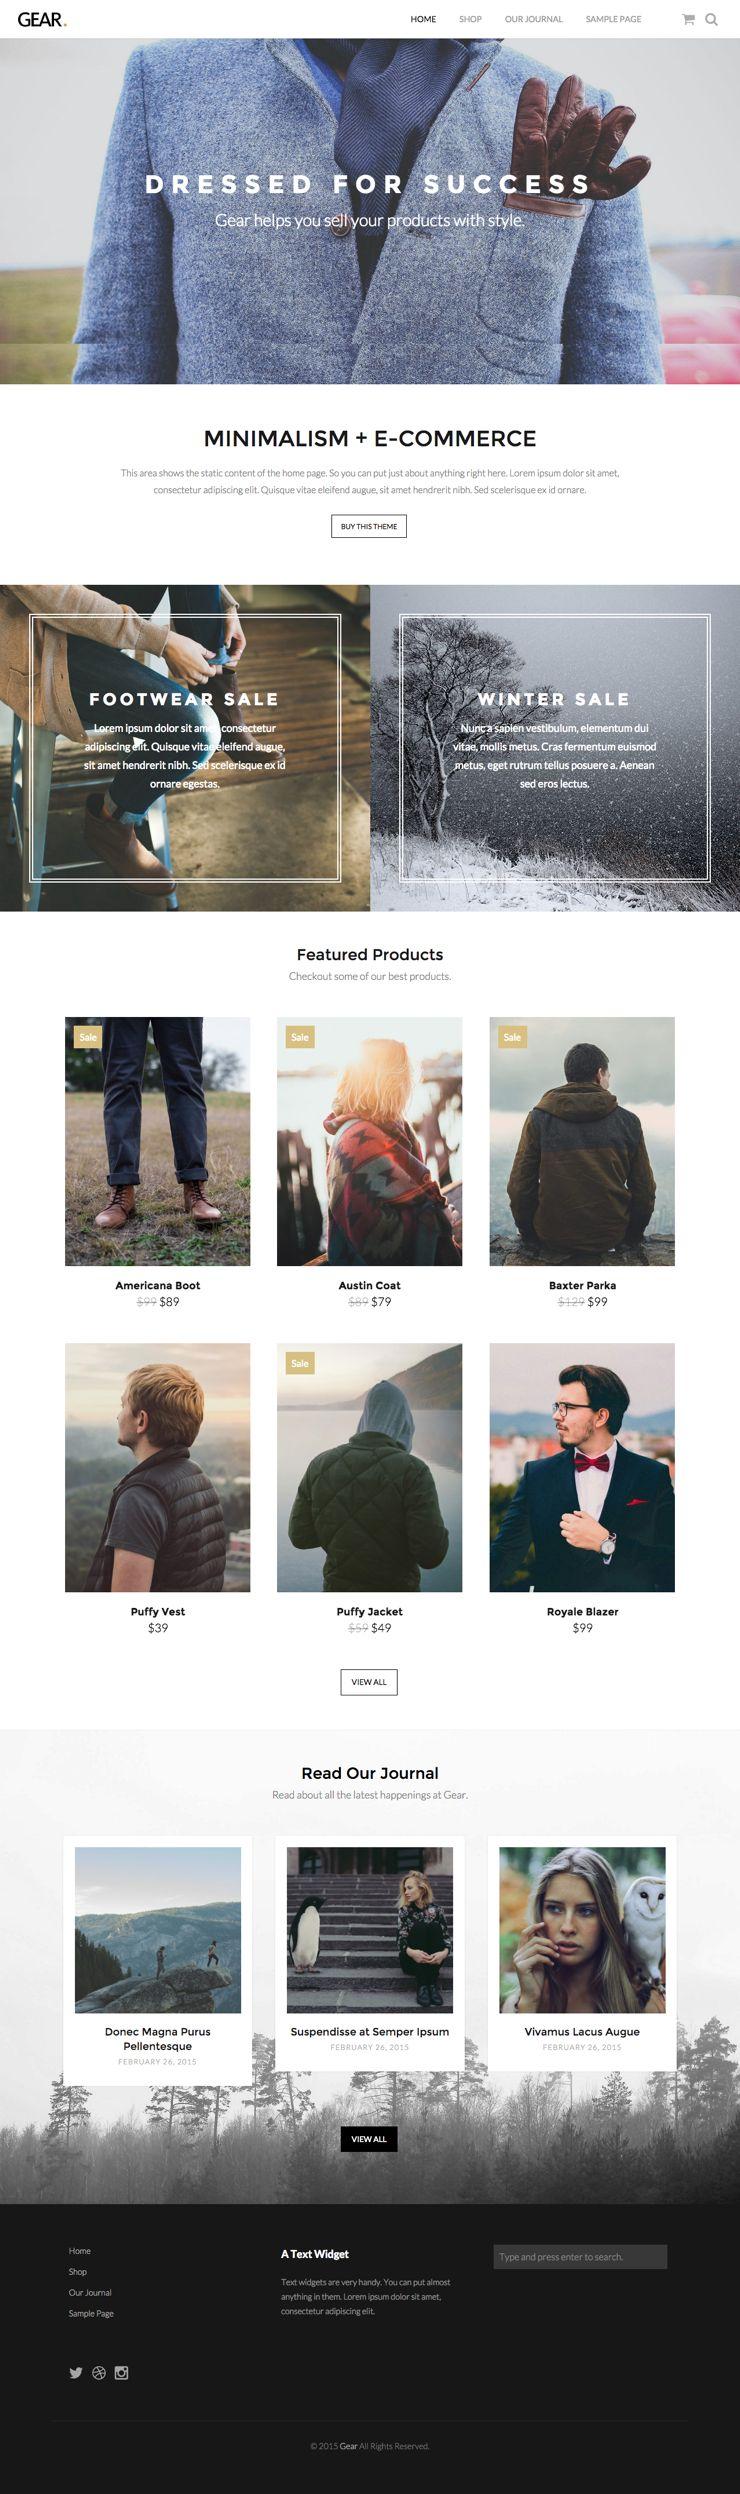 Gear WordPress E-commerce Product Theme